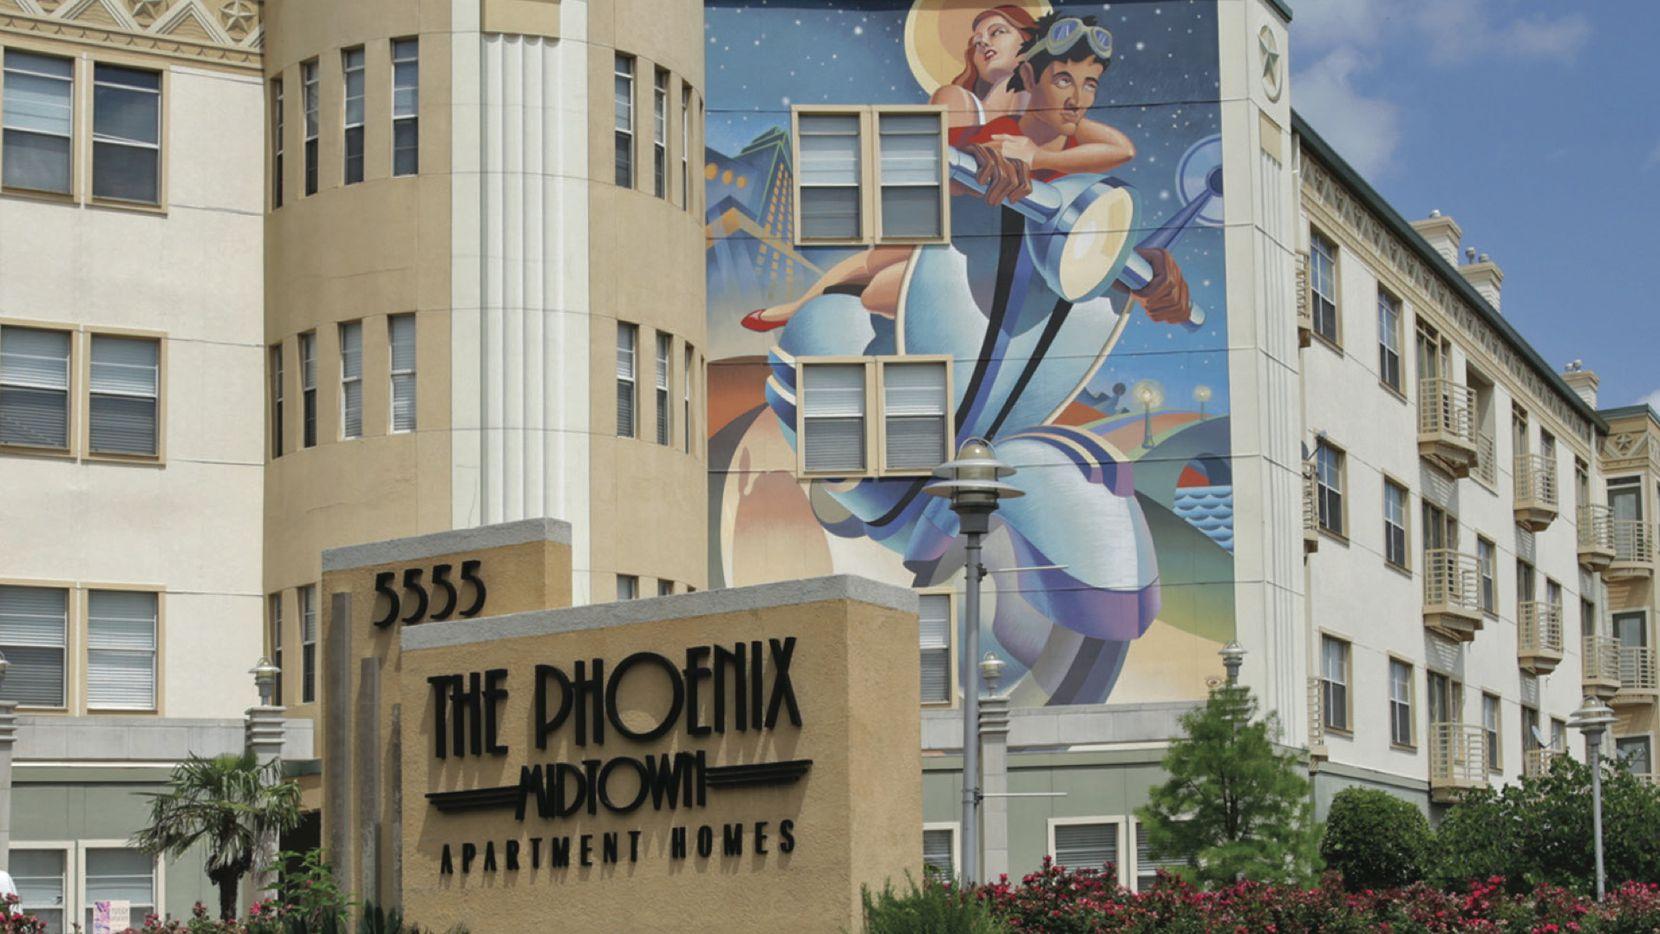 The Phoenix Midtown apartments are next to DART's Mockingbird Station.